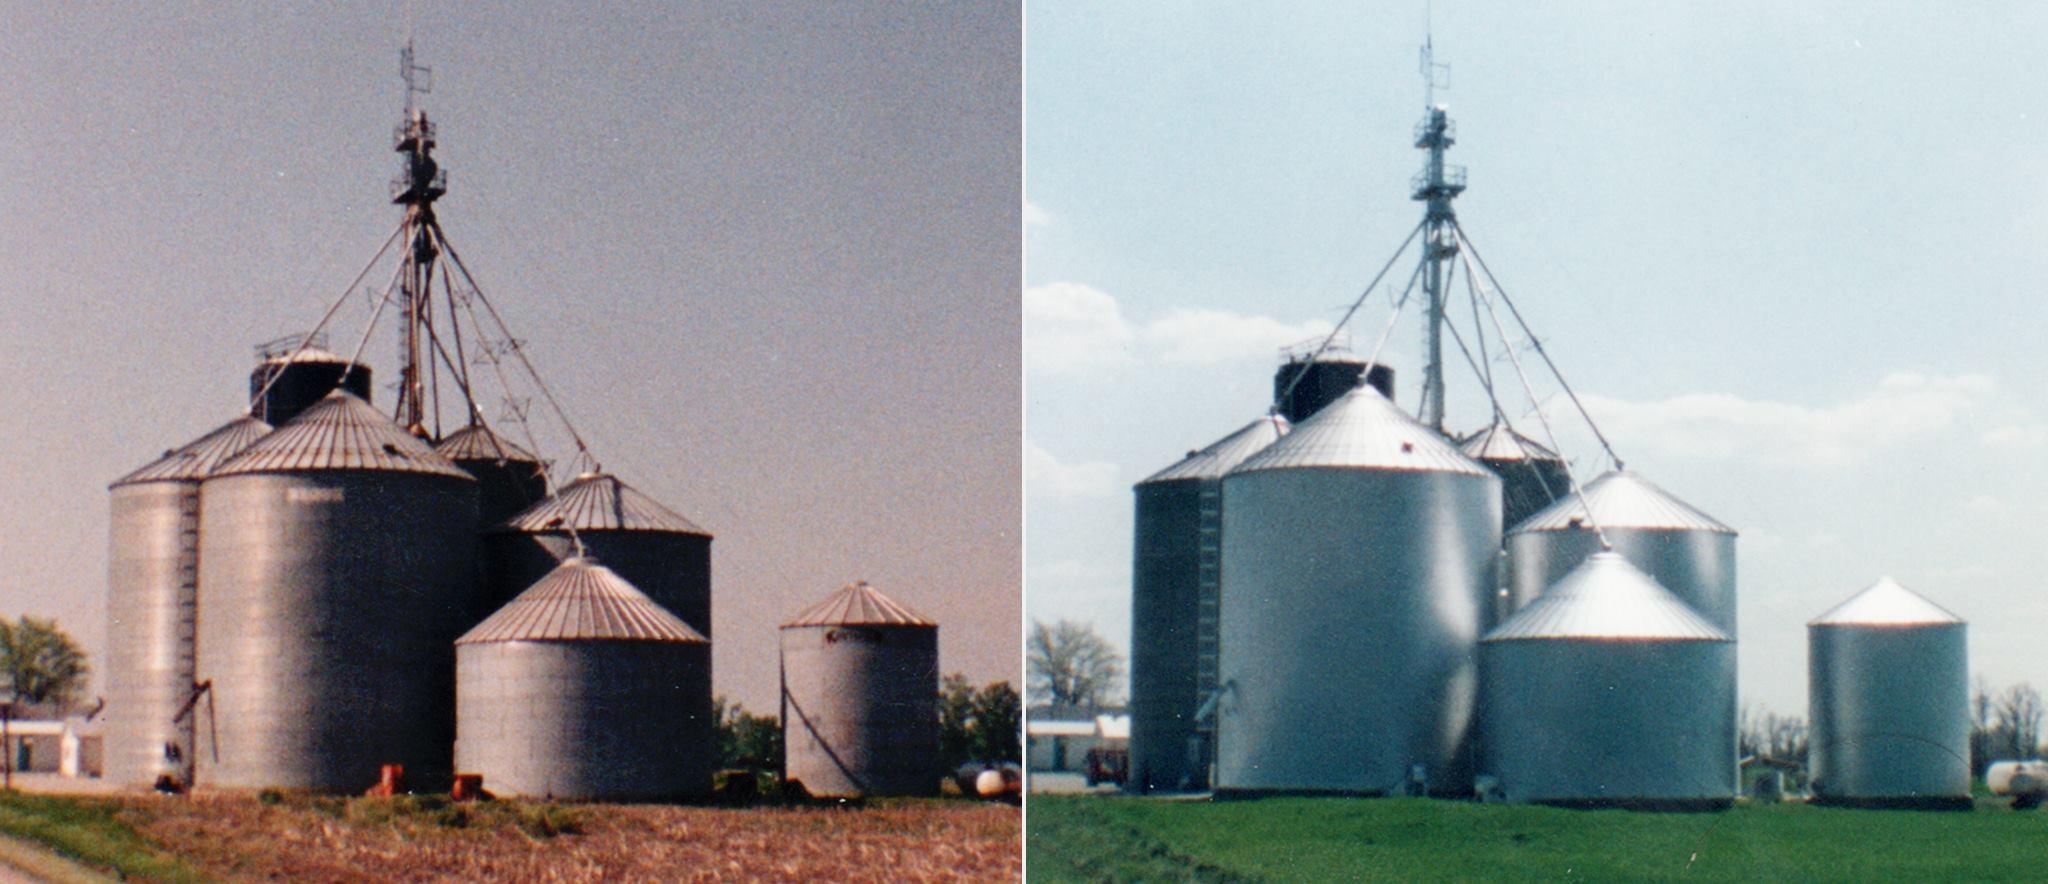 Home - Grain Bin Painters